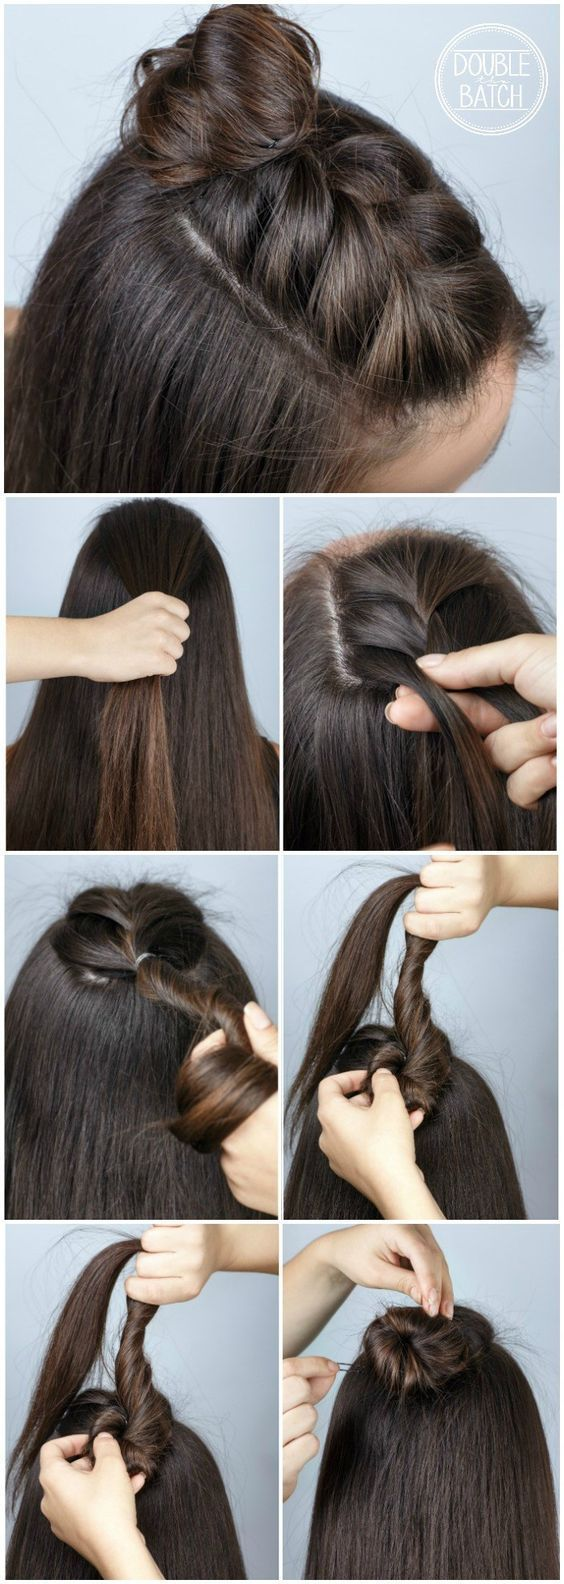 Half Braid Tutorial + Video hairstyle tutorial Inc…